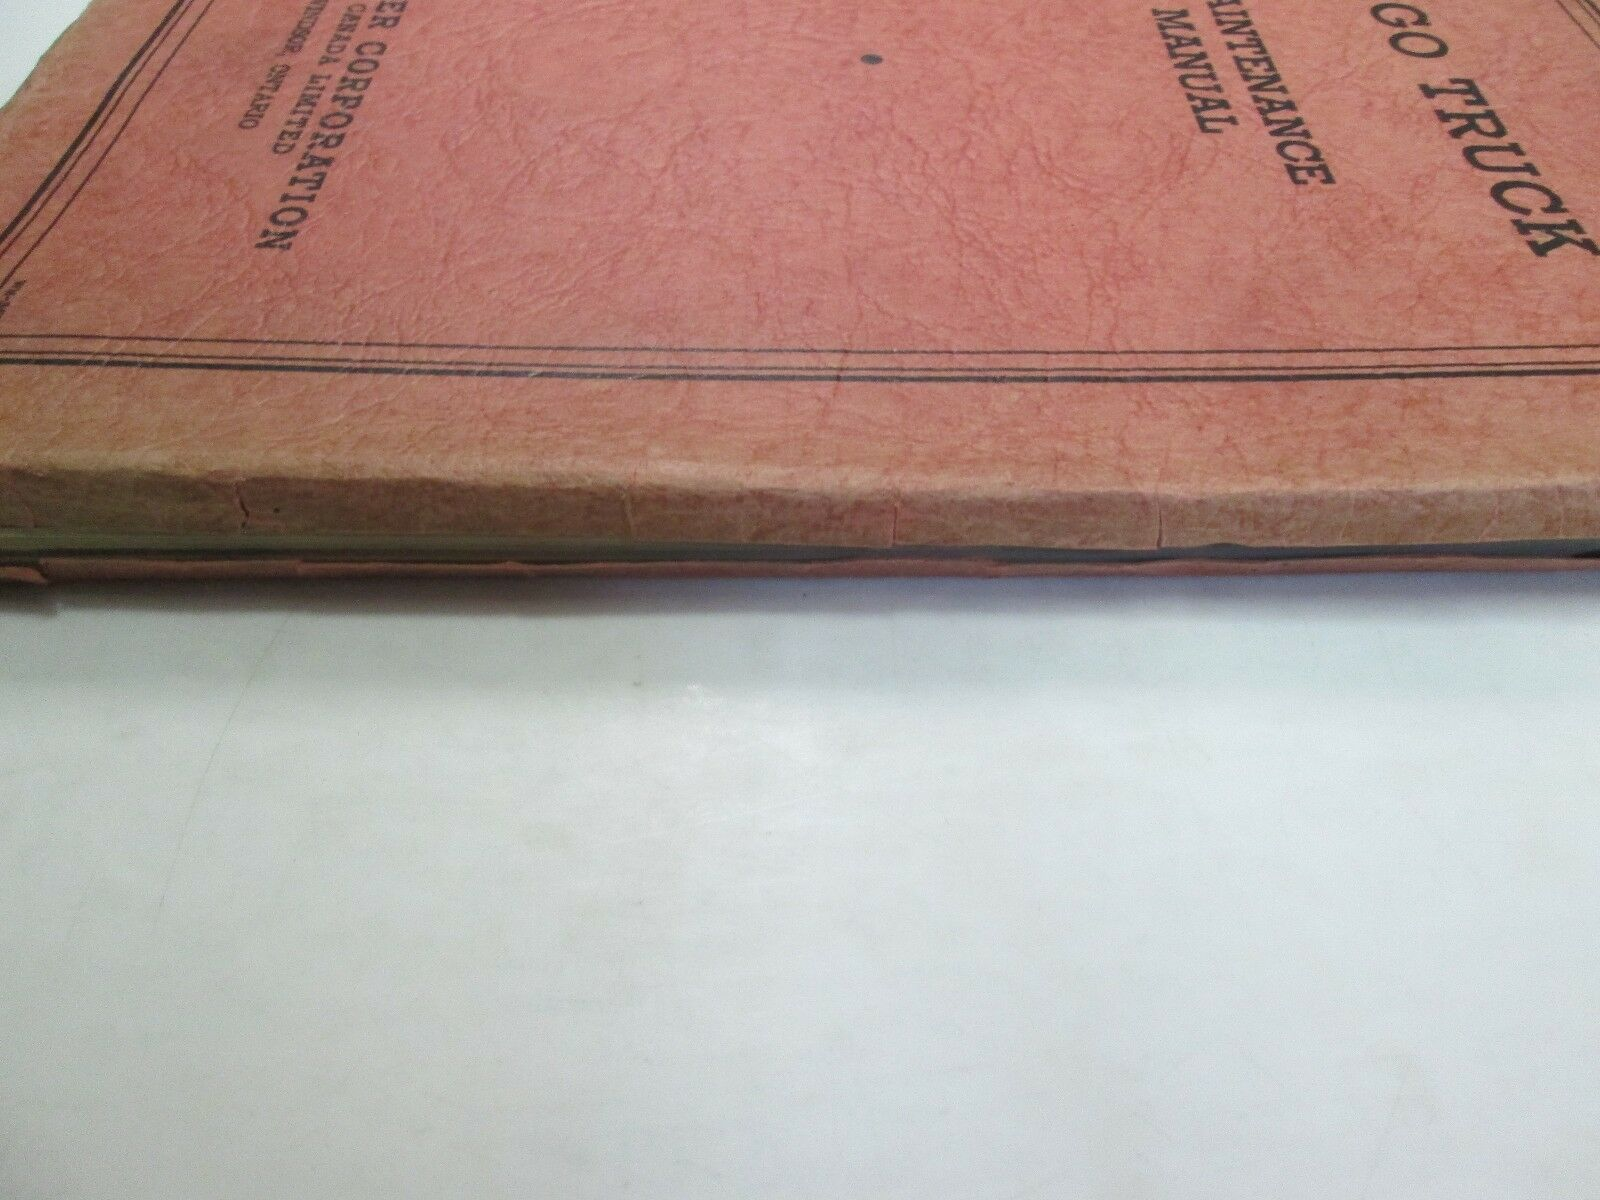 1935 Chrysler Fargo Truck Maintenance Manual MINOR WEAR FACTORY FEO BOOK 35 DEAL